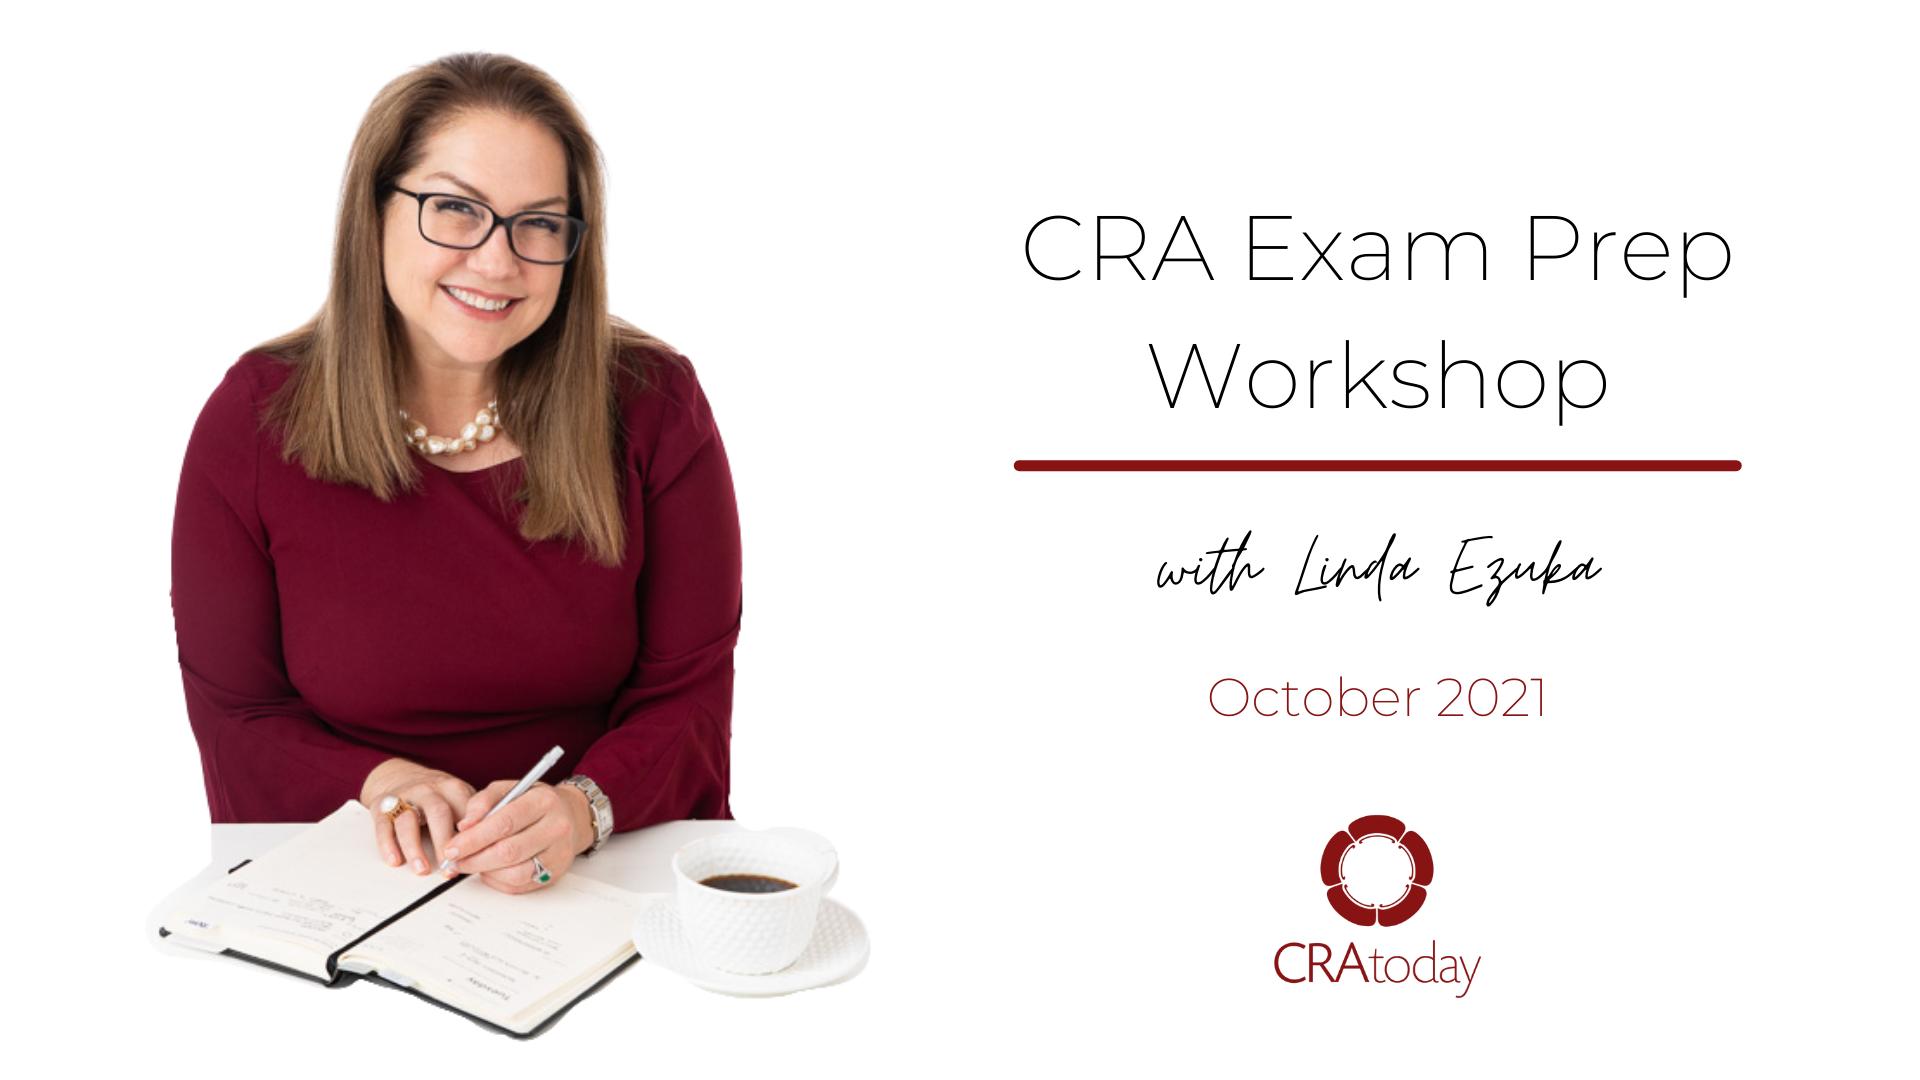 CRA Exam Prep Workshop with Linda Ezuka